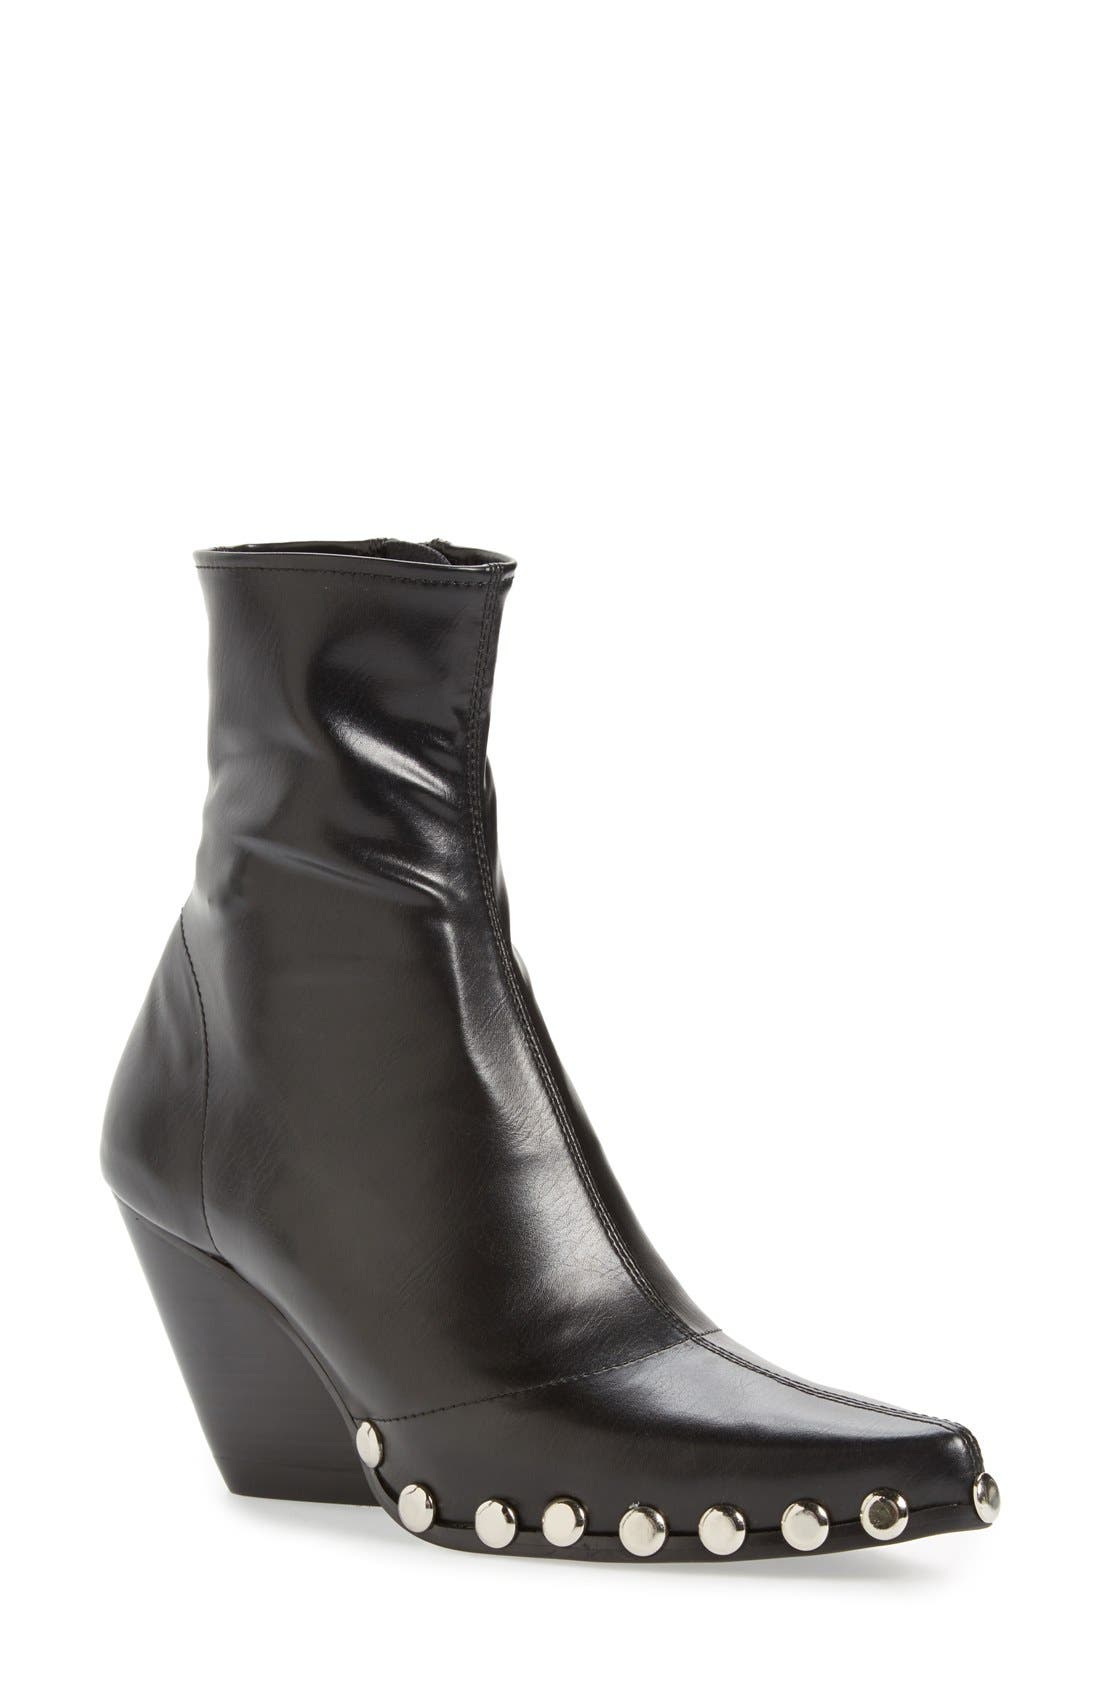 Main Image - Jeffrey Campbell 'Walton' Boot (Women)